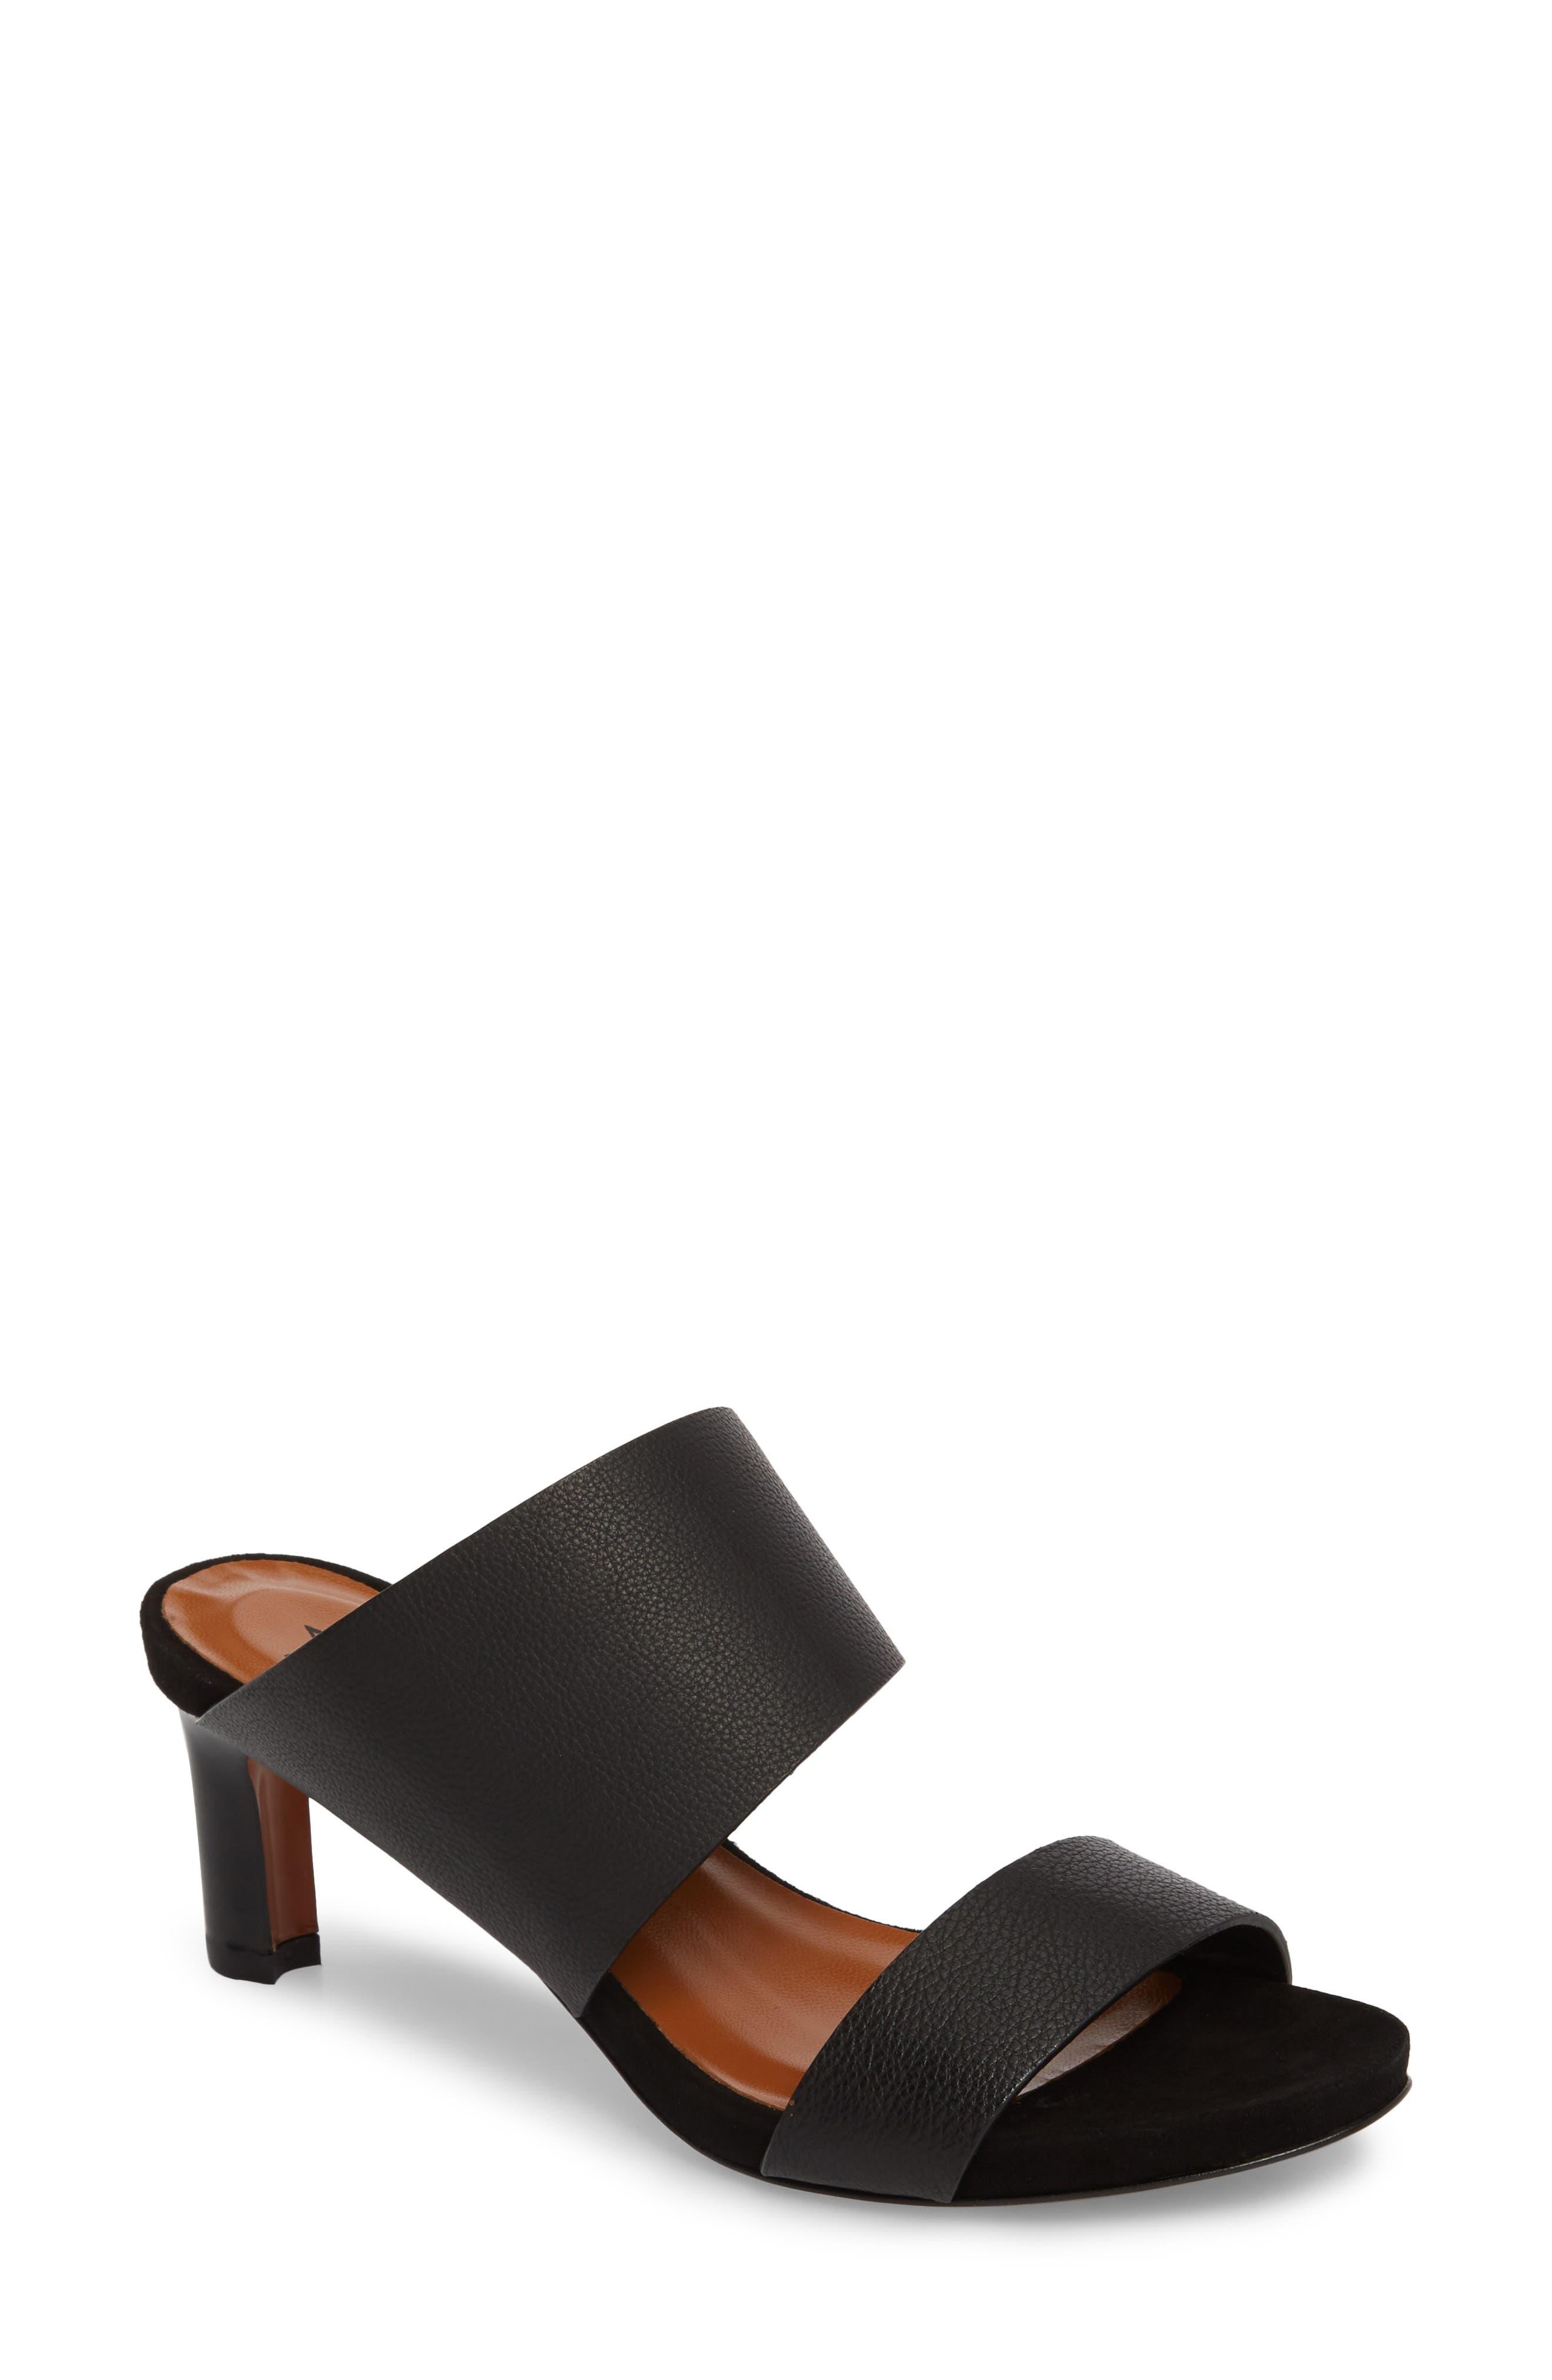 Birdie Sandal,                         Main,                         color,